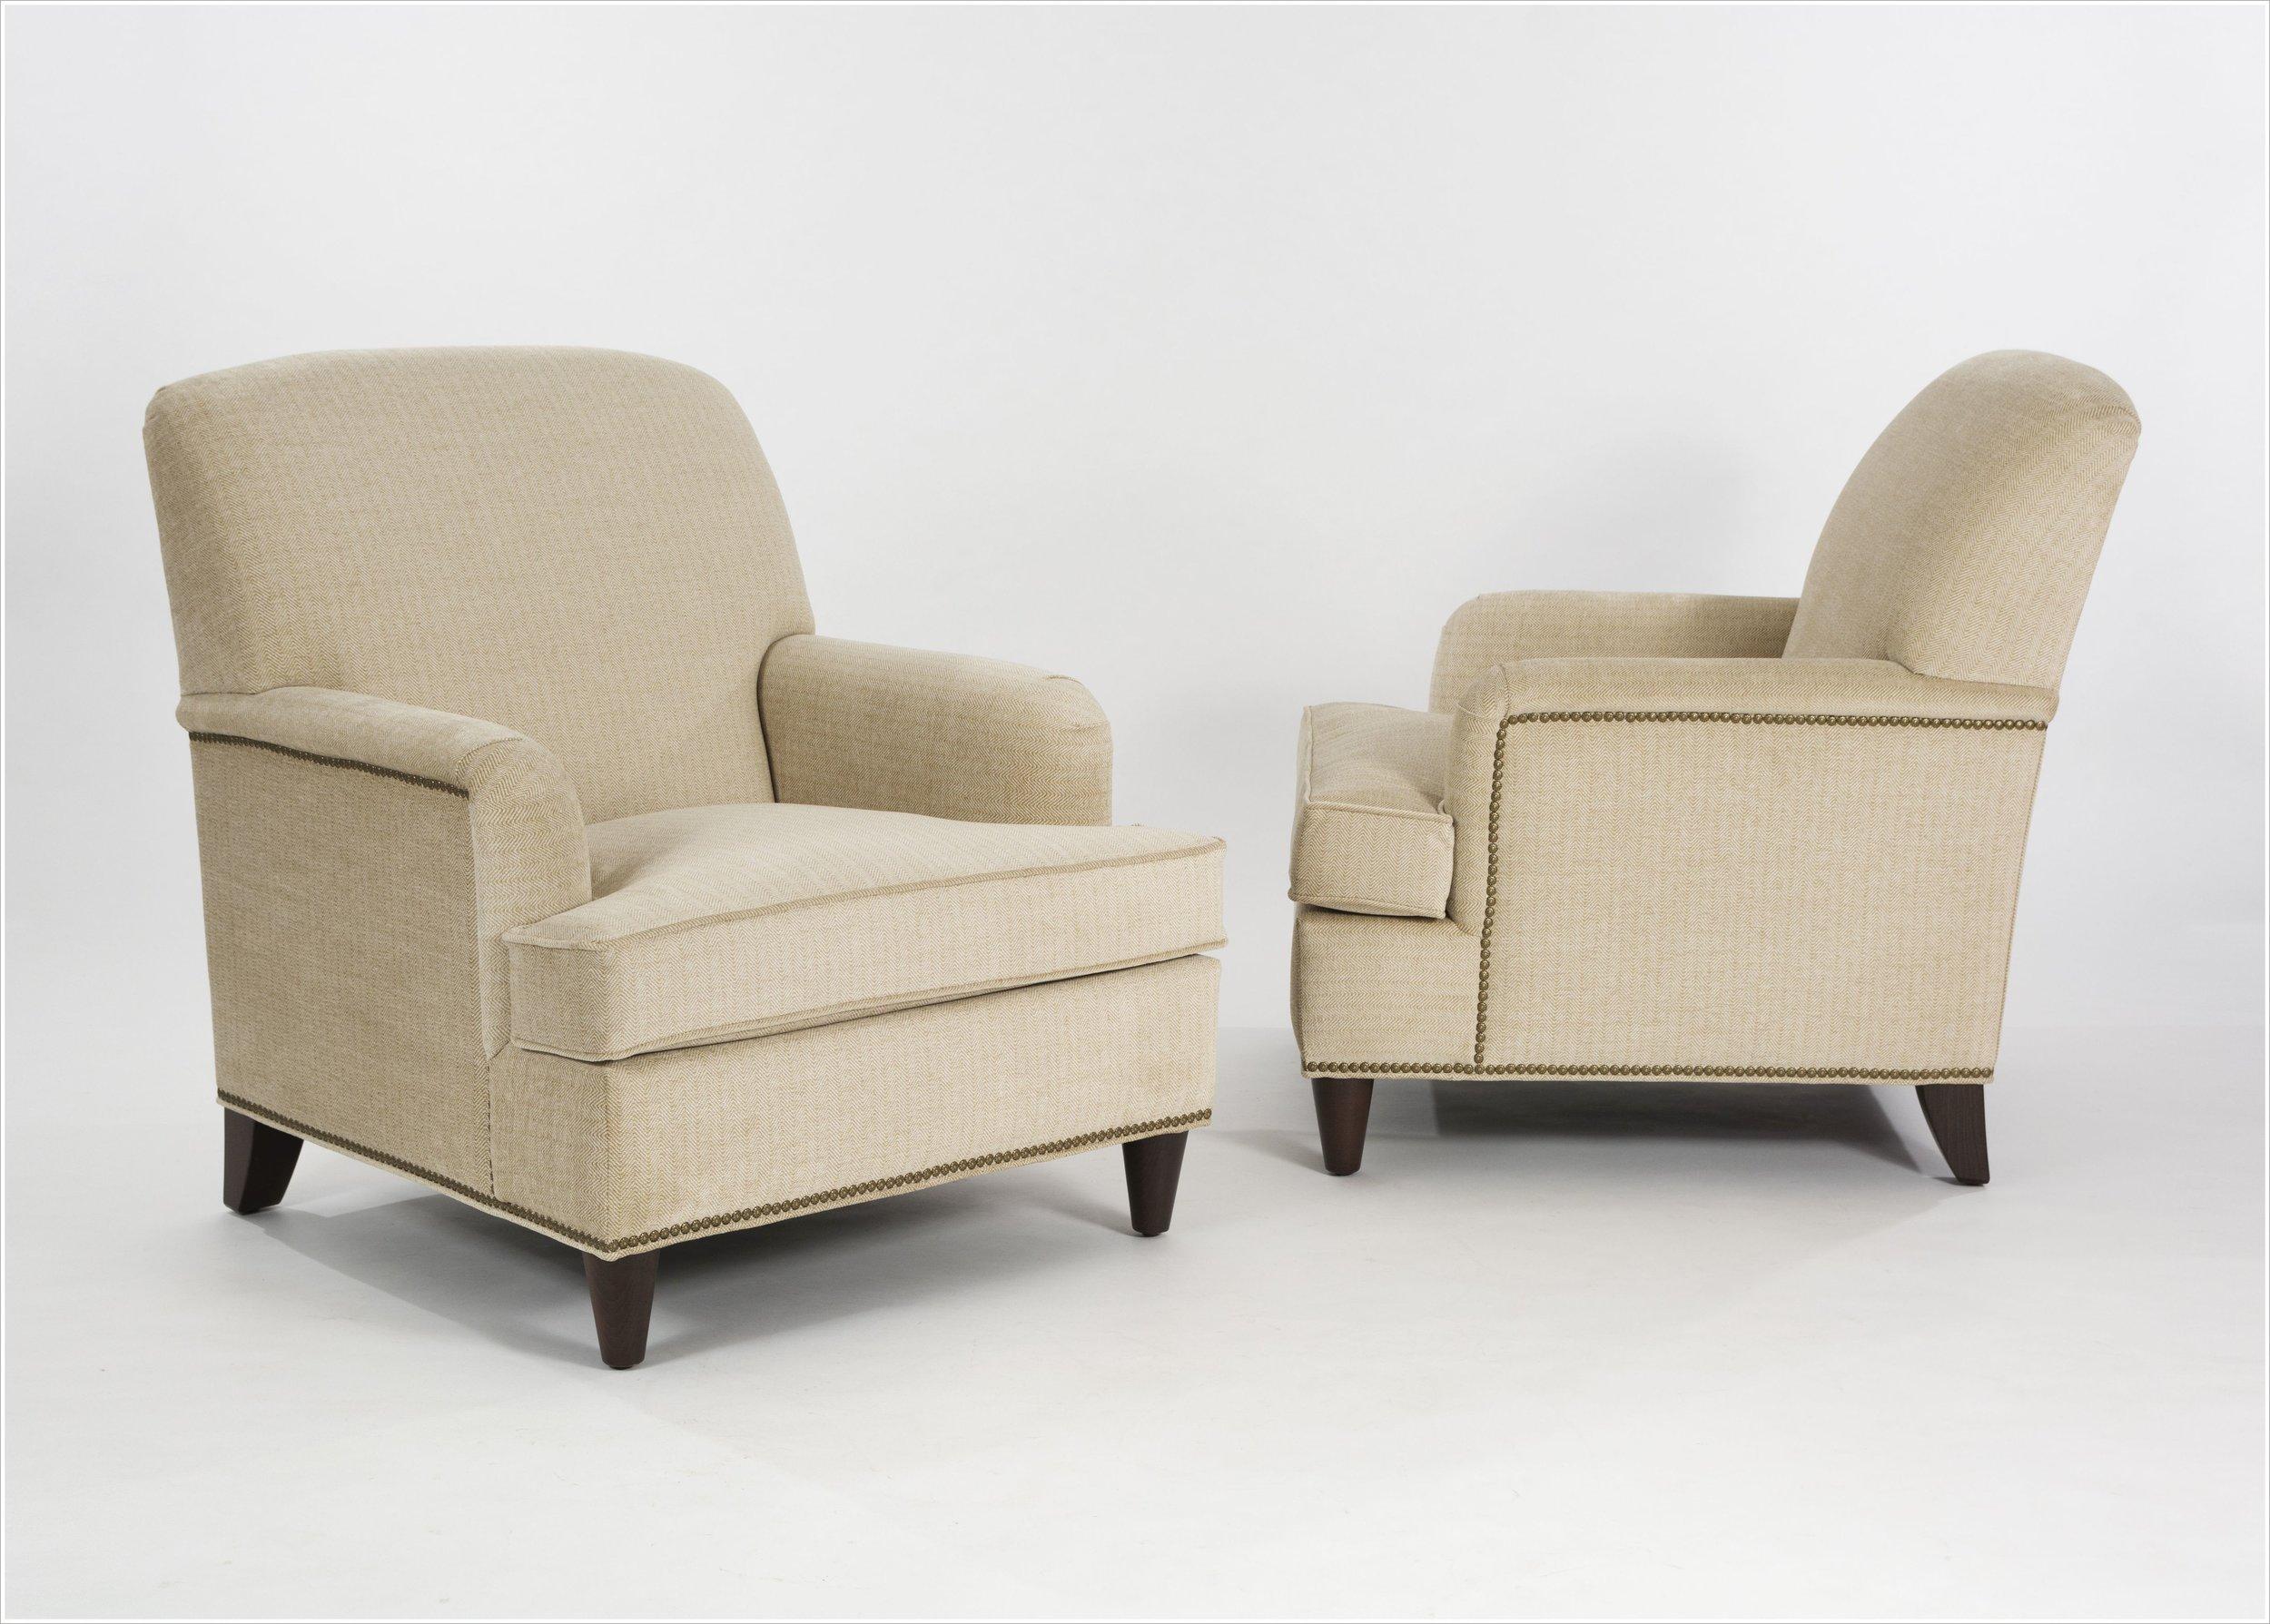 Custom Upholstered Club Chair